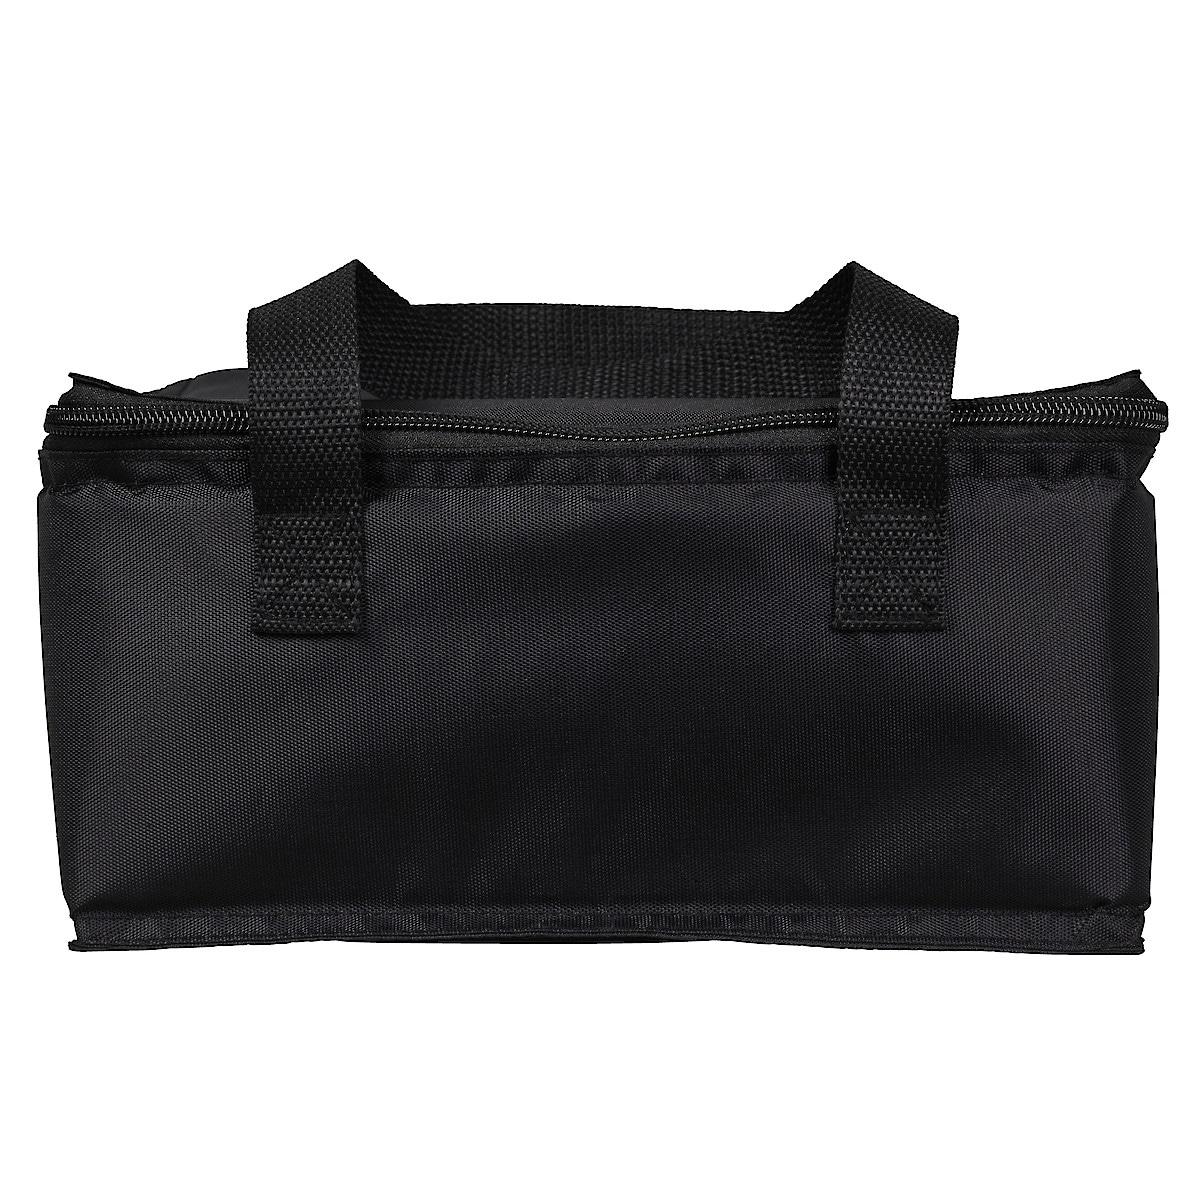 Kylmä-/lounaslaukku